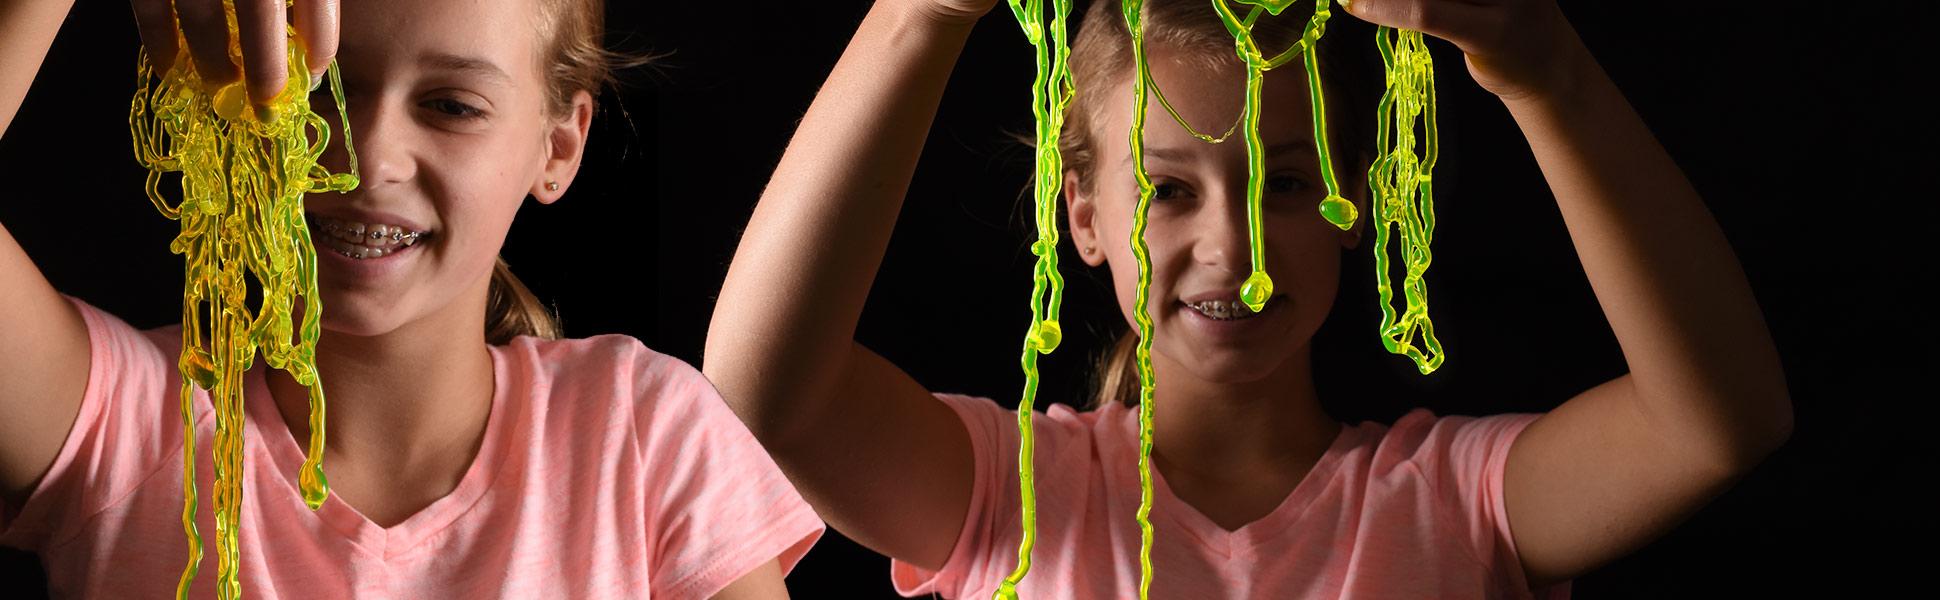 Atomic String Slime